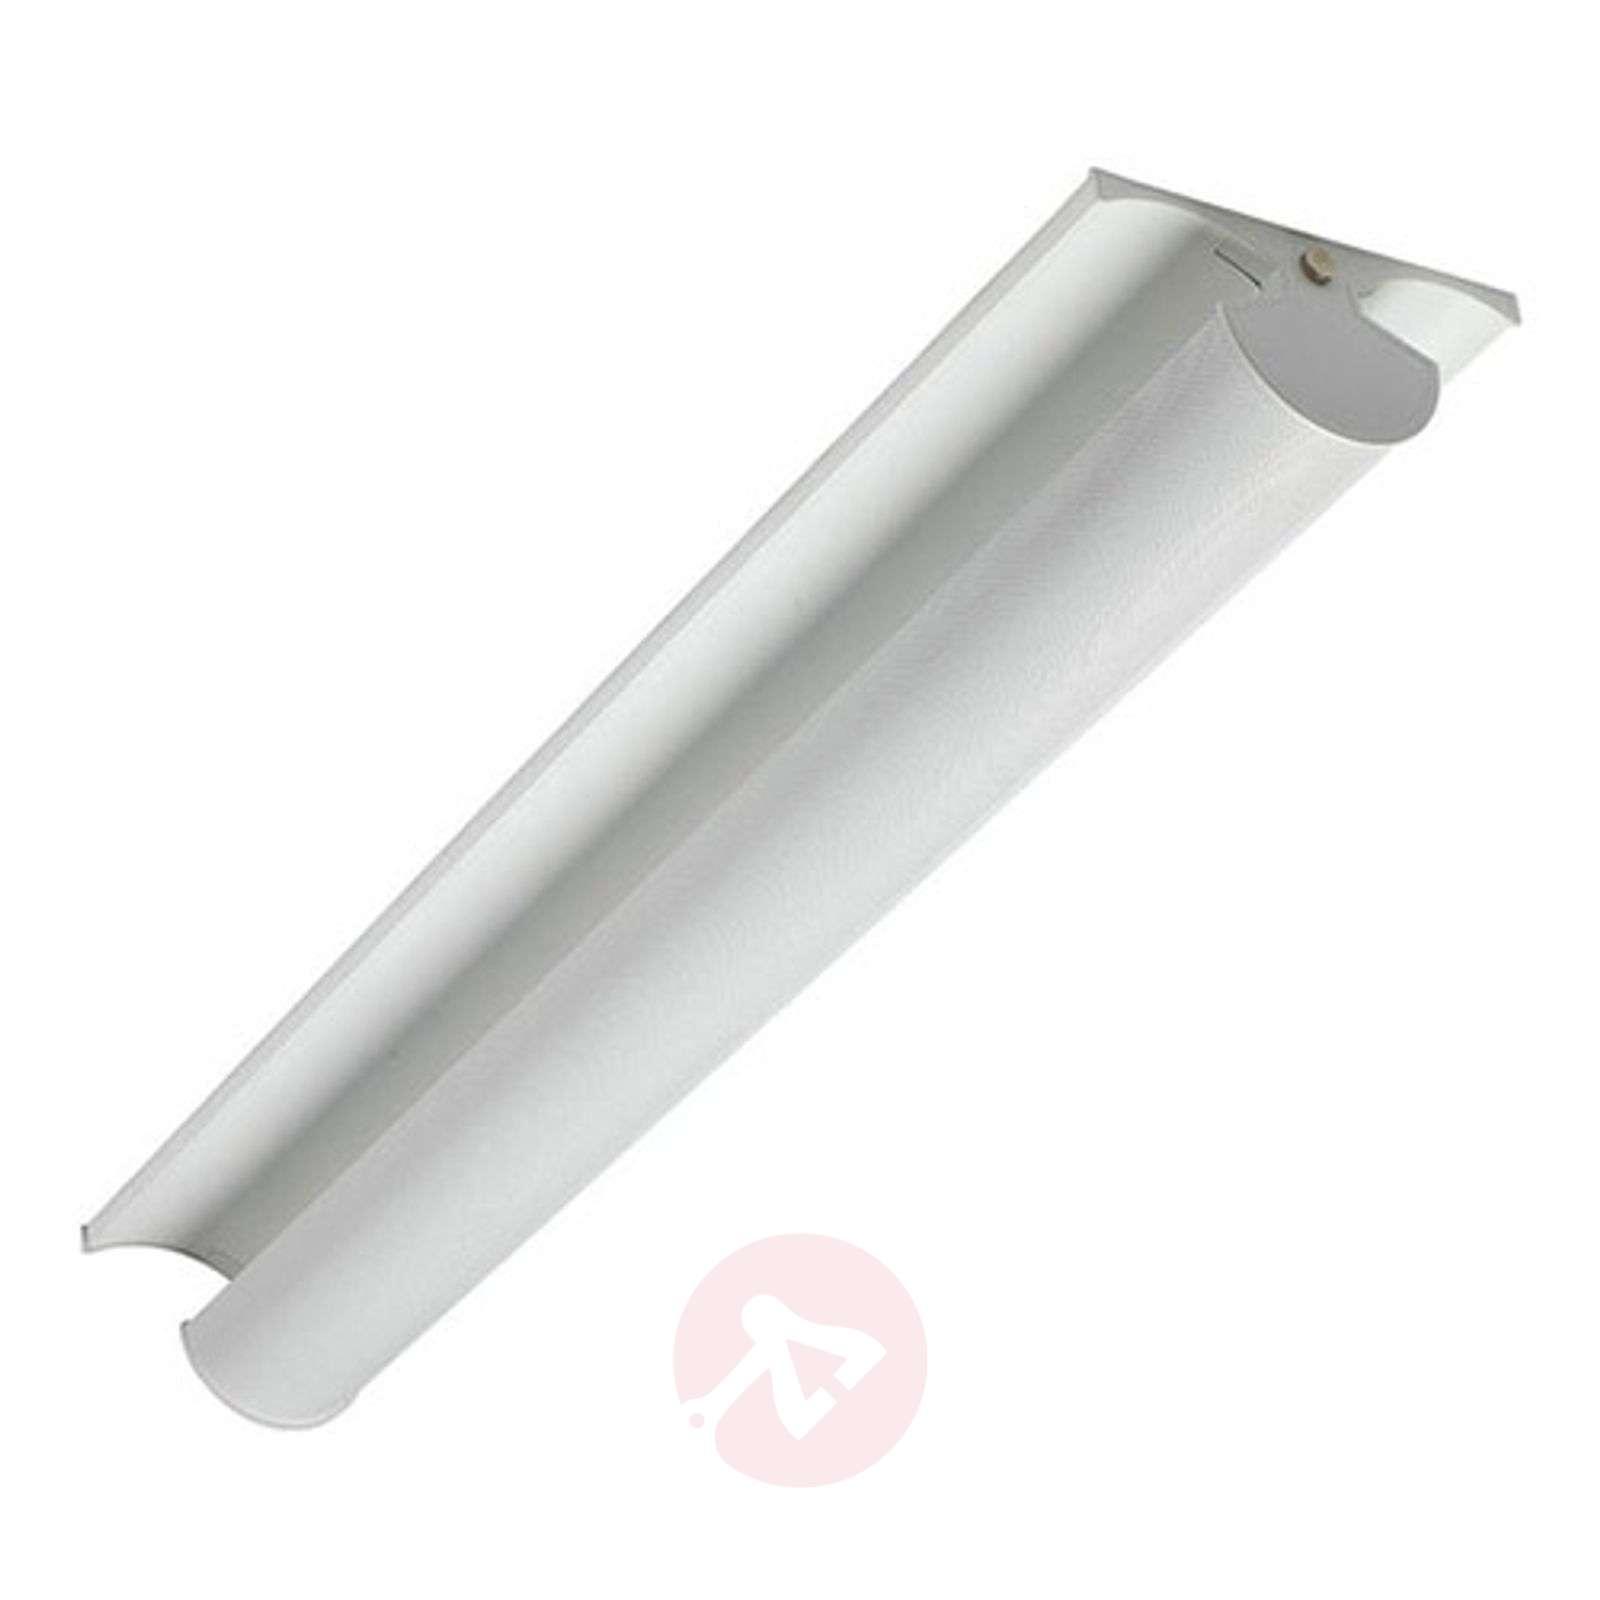 Ceiling light FLW for soft light 2x36W-1002351-02